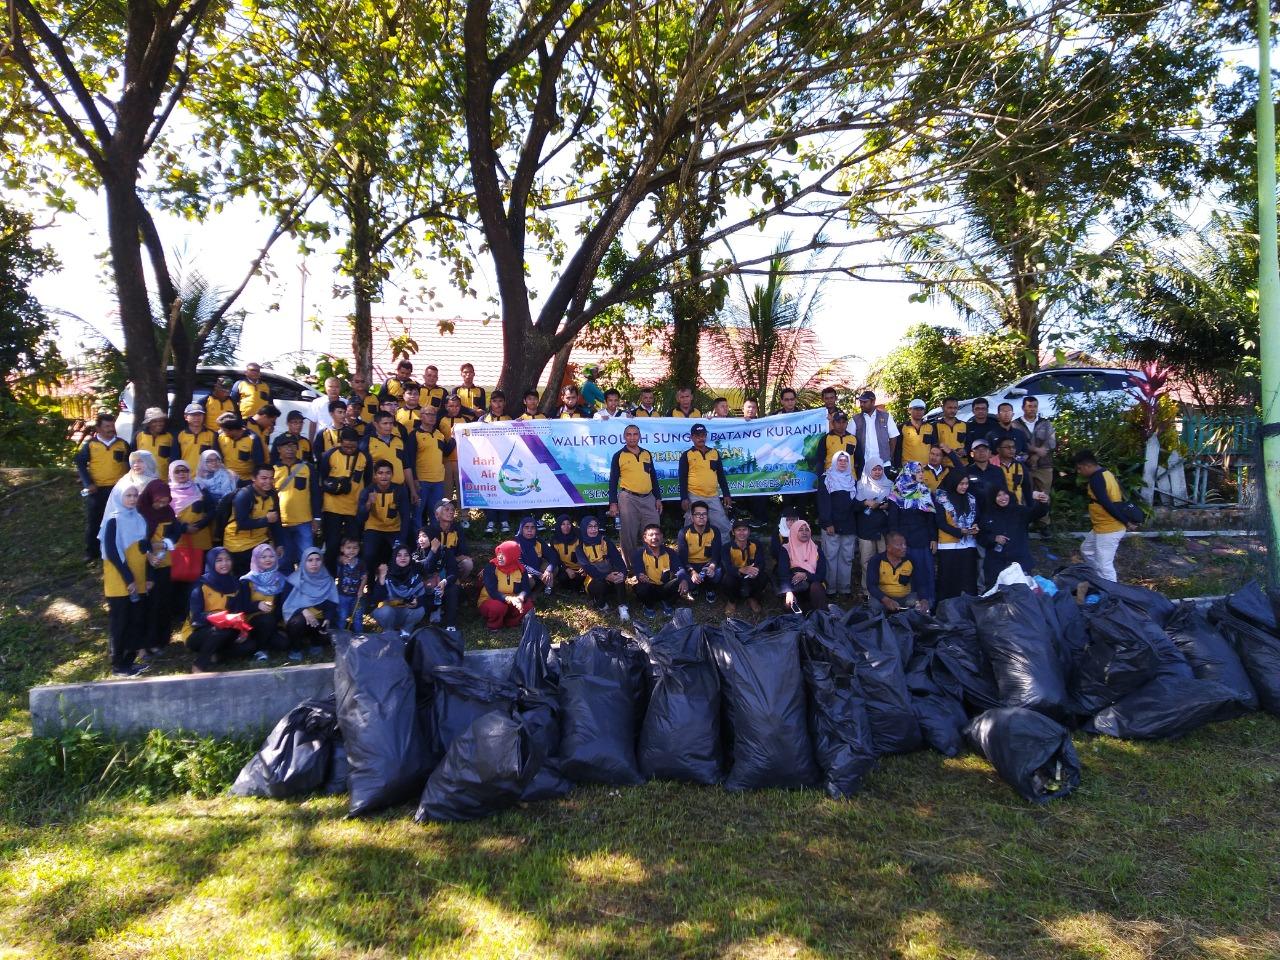 Walkthrough Sungai Batang Kuranji Untuk Inventarisir Kerusakan dan Upaya Antisipasi Banjir